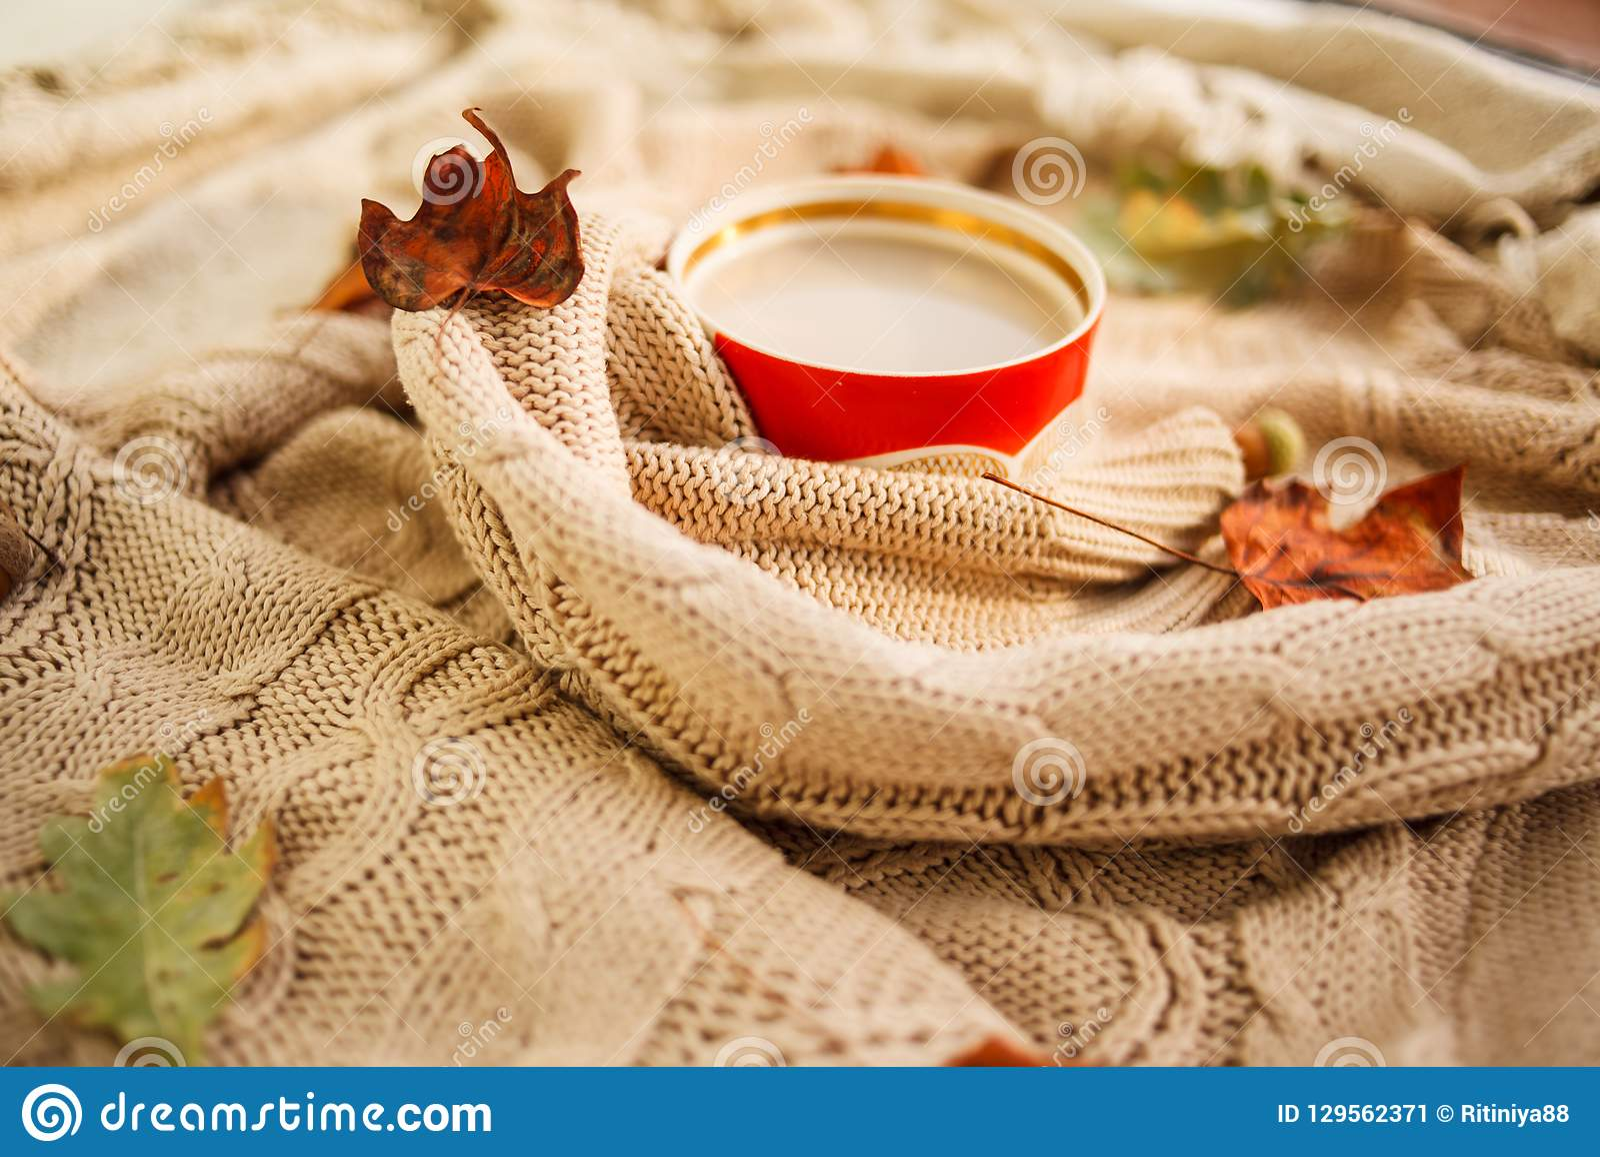 Varm höst kopp kaffe som slås in i en woolen beige tröja 1 livstid fortfarande